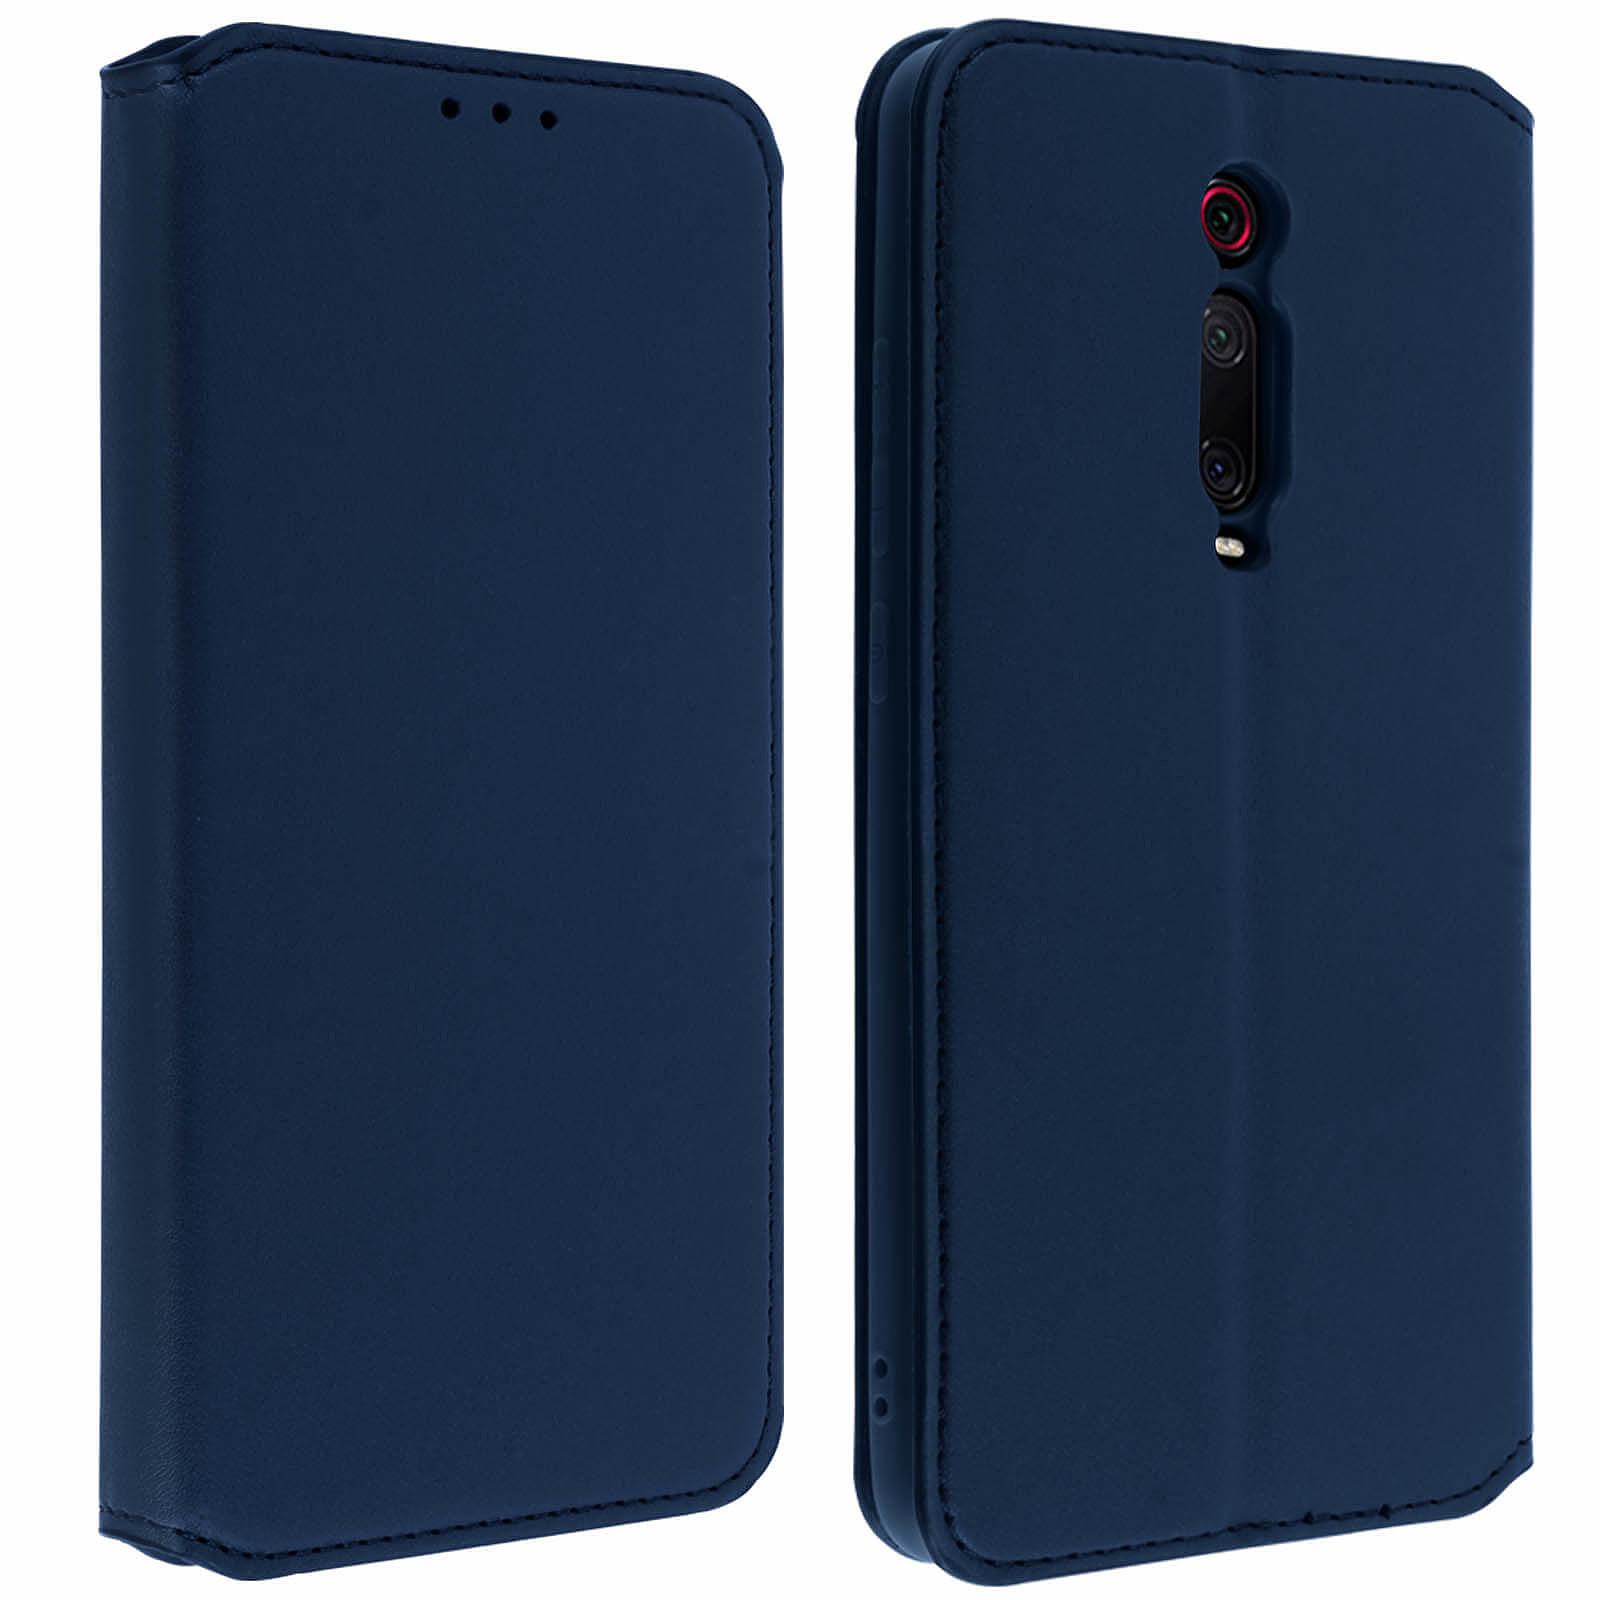 Avizar Etui folio Bleu Nuit pour Xiaomi Mi 9T , Xiaomi Mi 9T Pro